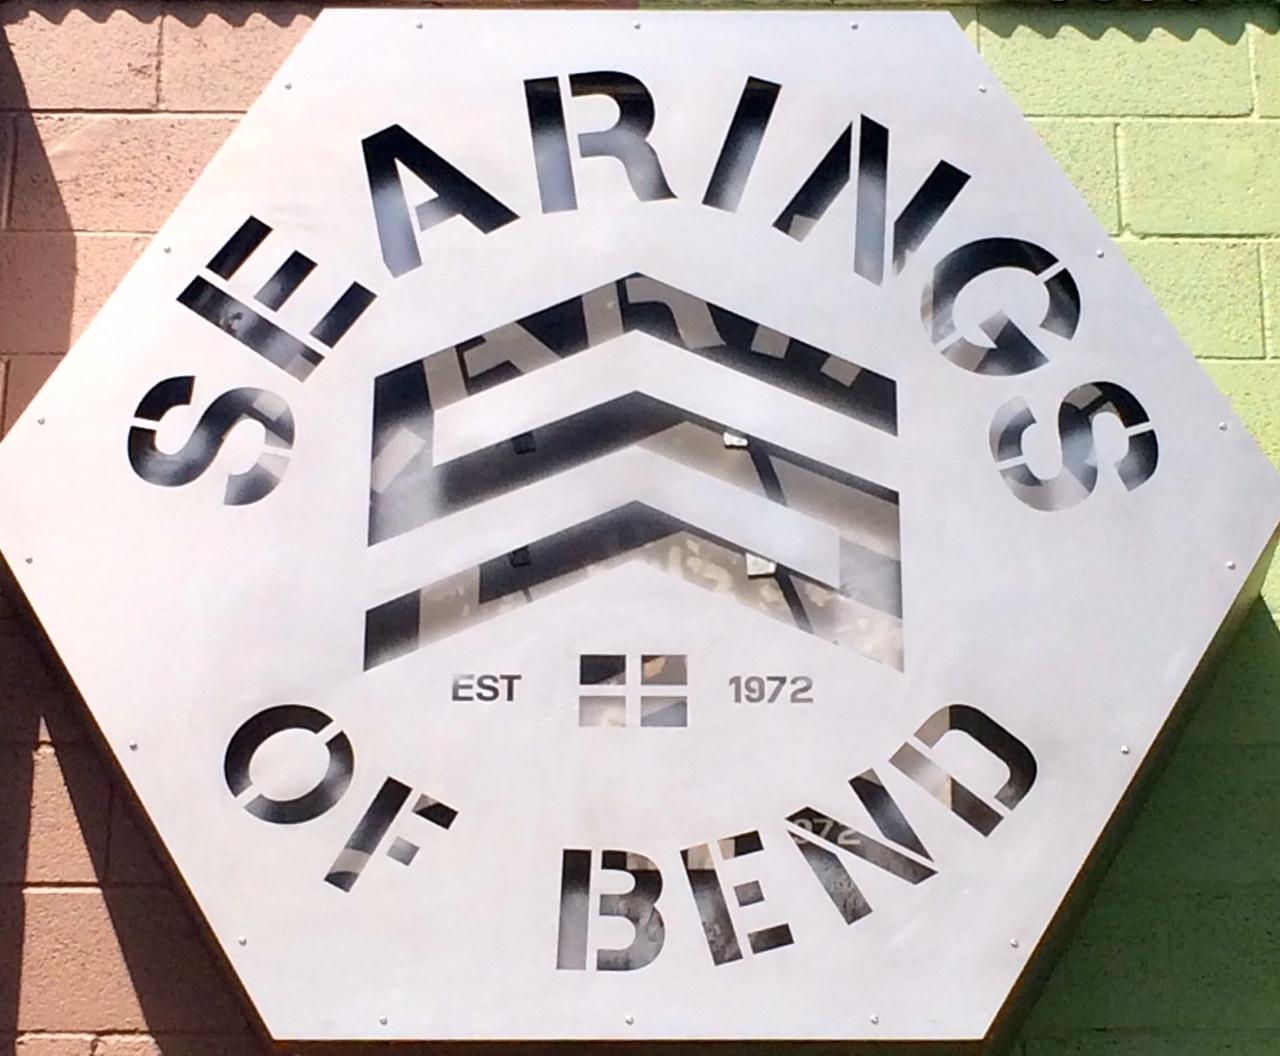 Searings of Bend logo